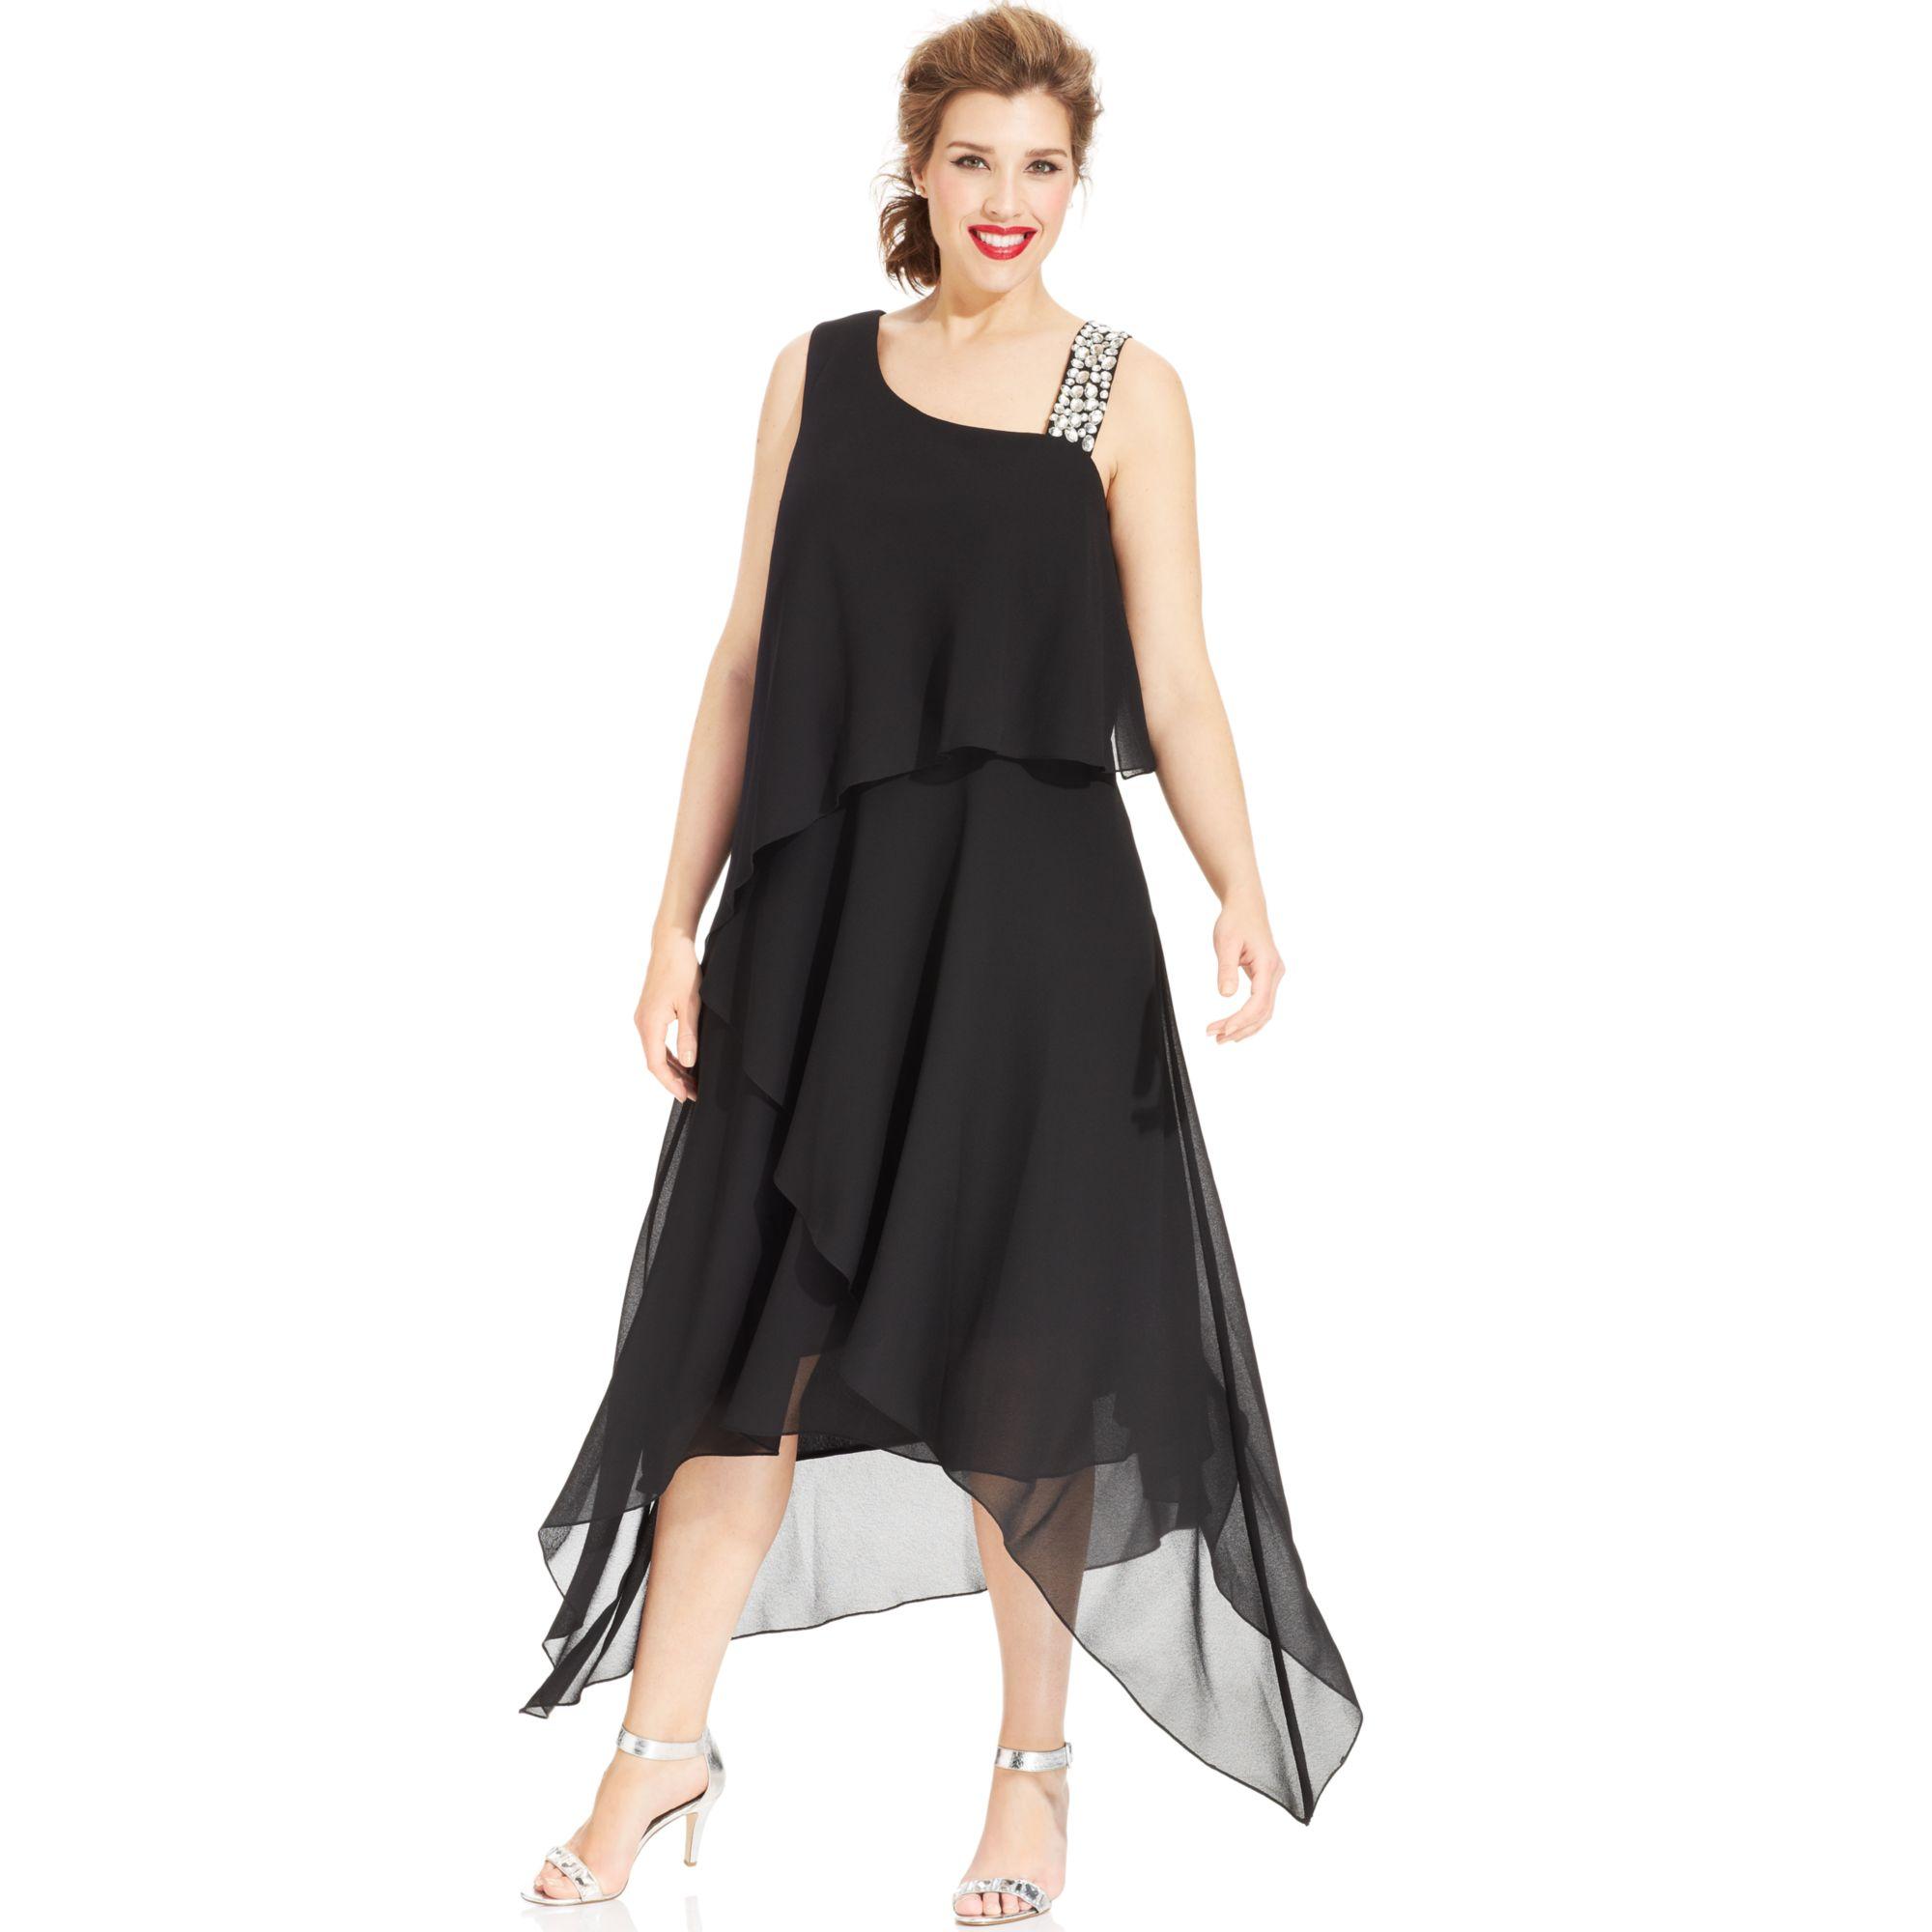 Dress Barn Plus Size Dressy Dresses By Alex Evenings Best Dresses